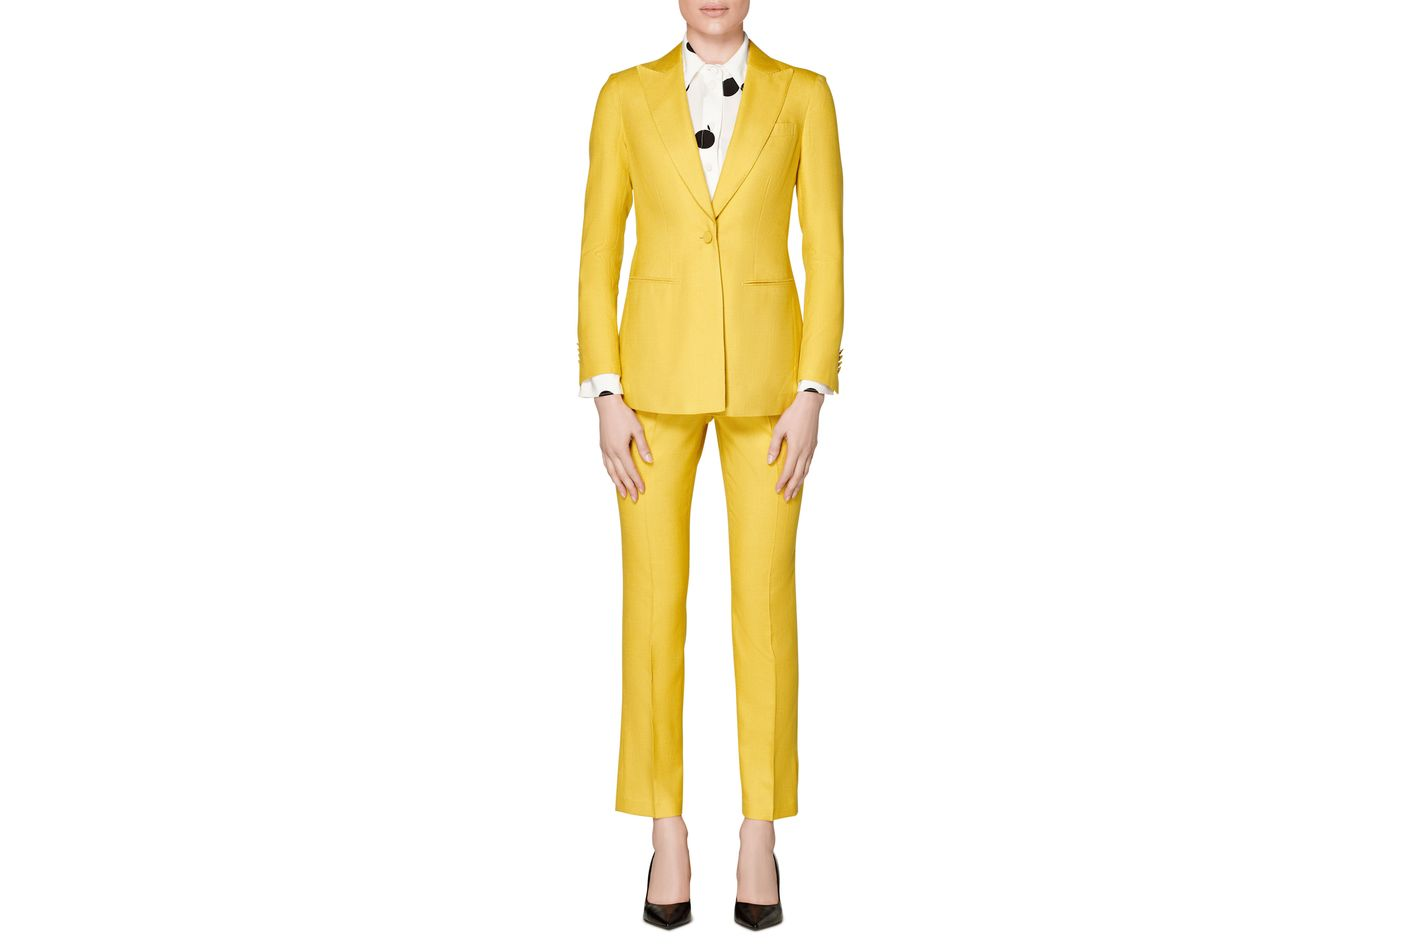 Suistudio Cameron Suit